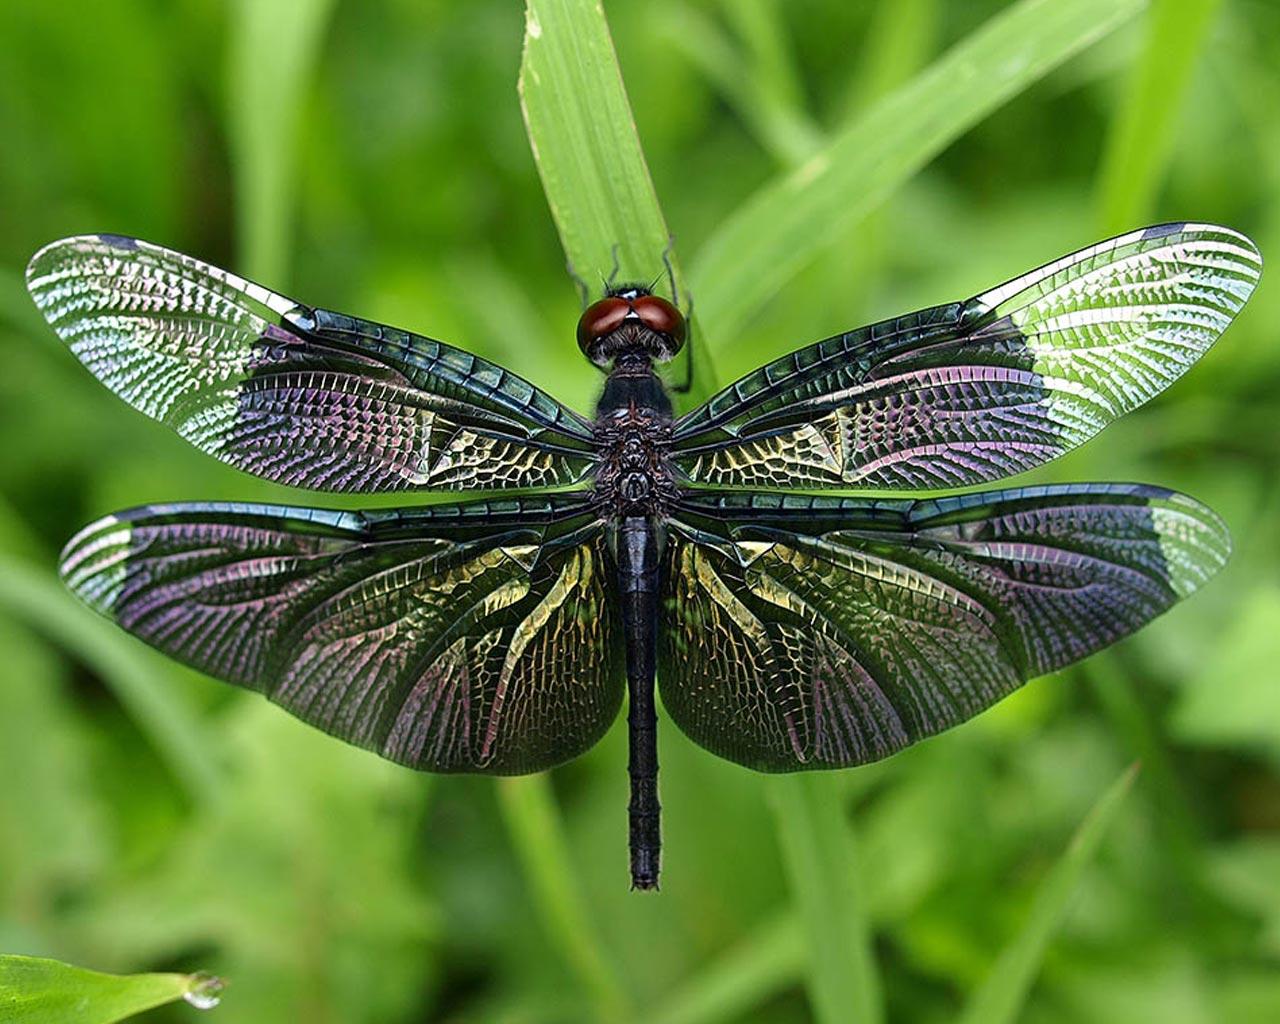 Dragonfly | The Biggest Animals Kingdom